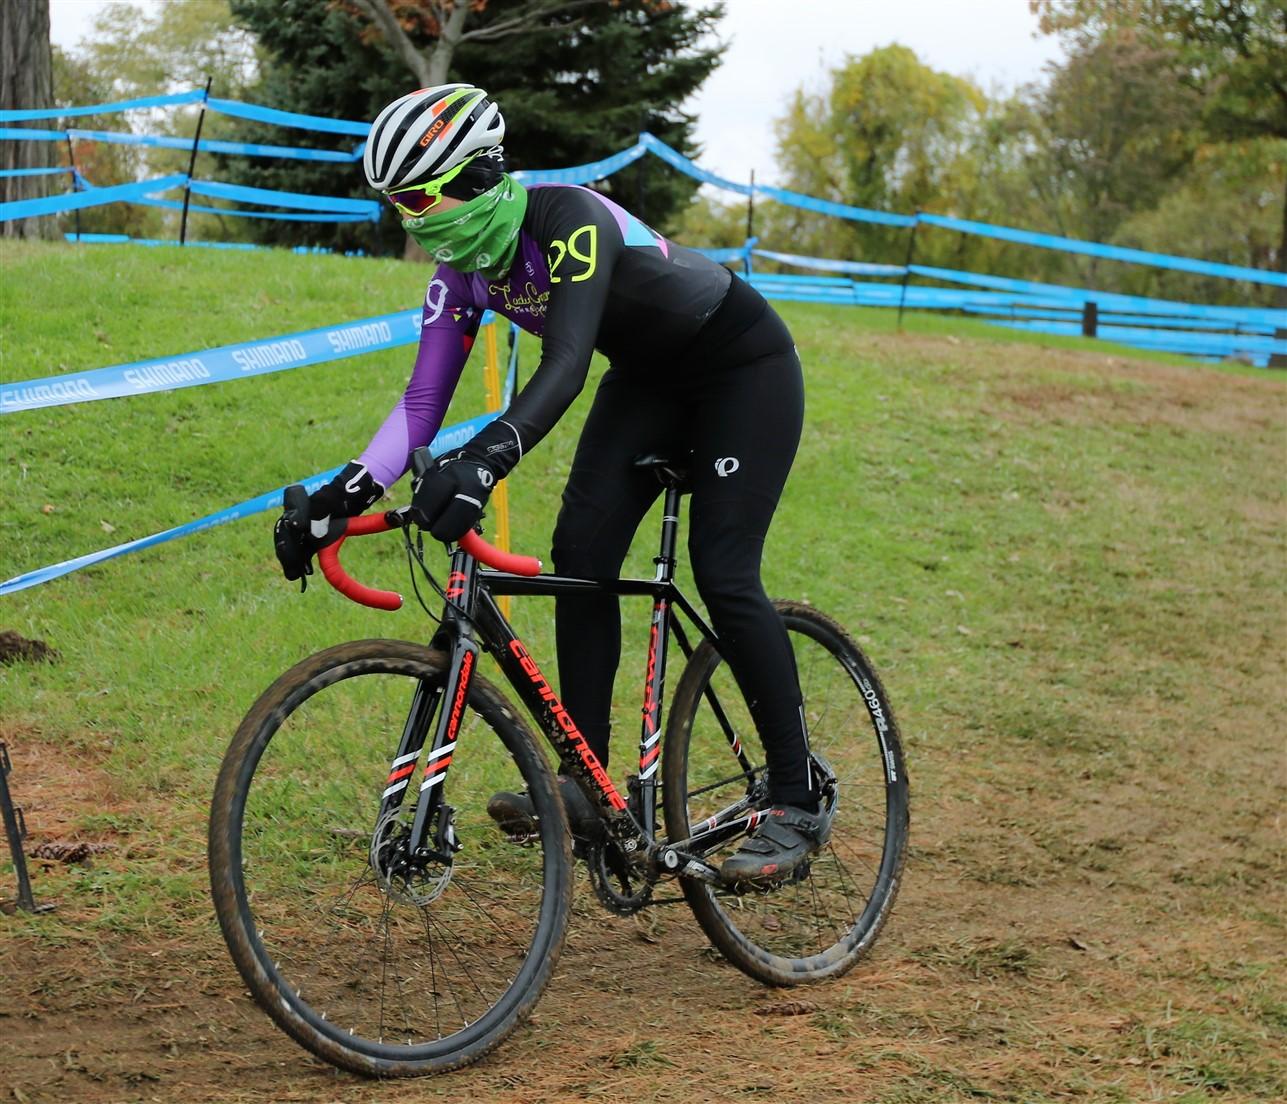 2017 10 29 81 Fairfield OH Cincinnati Cyclocross.jpg